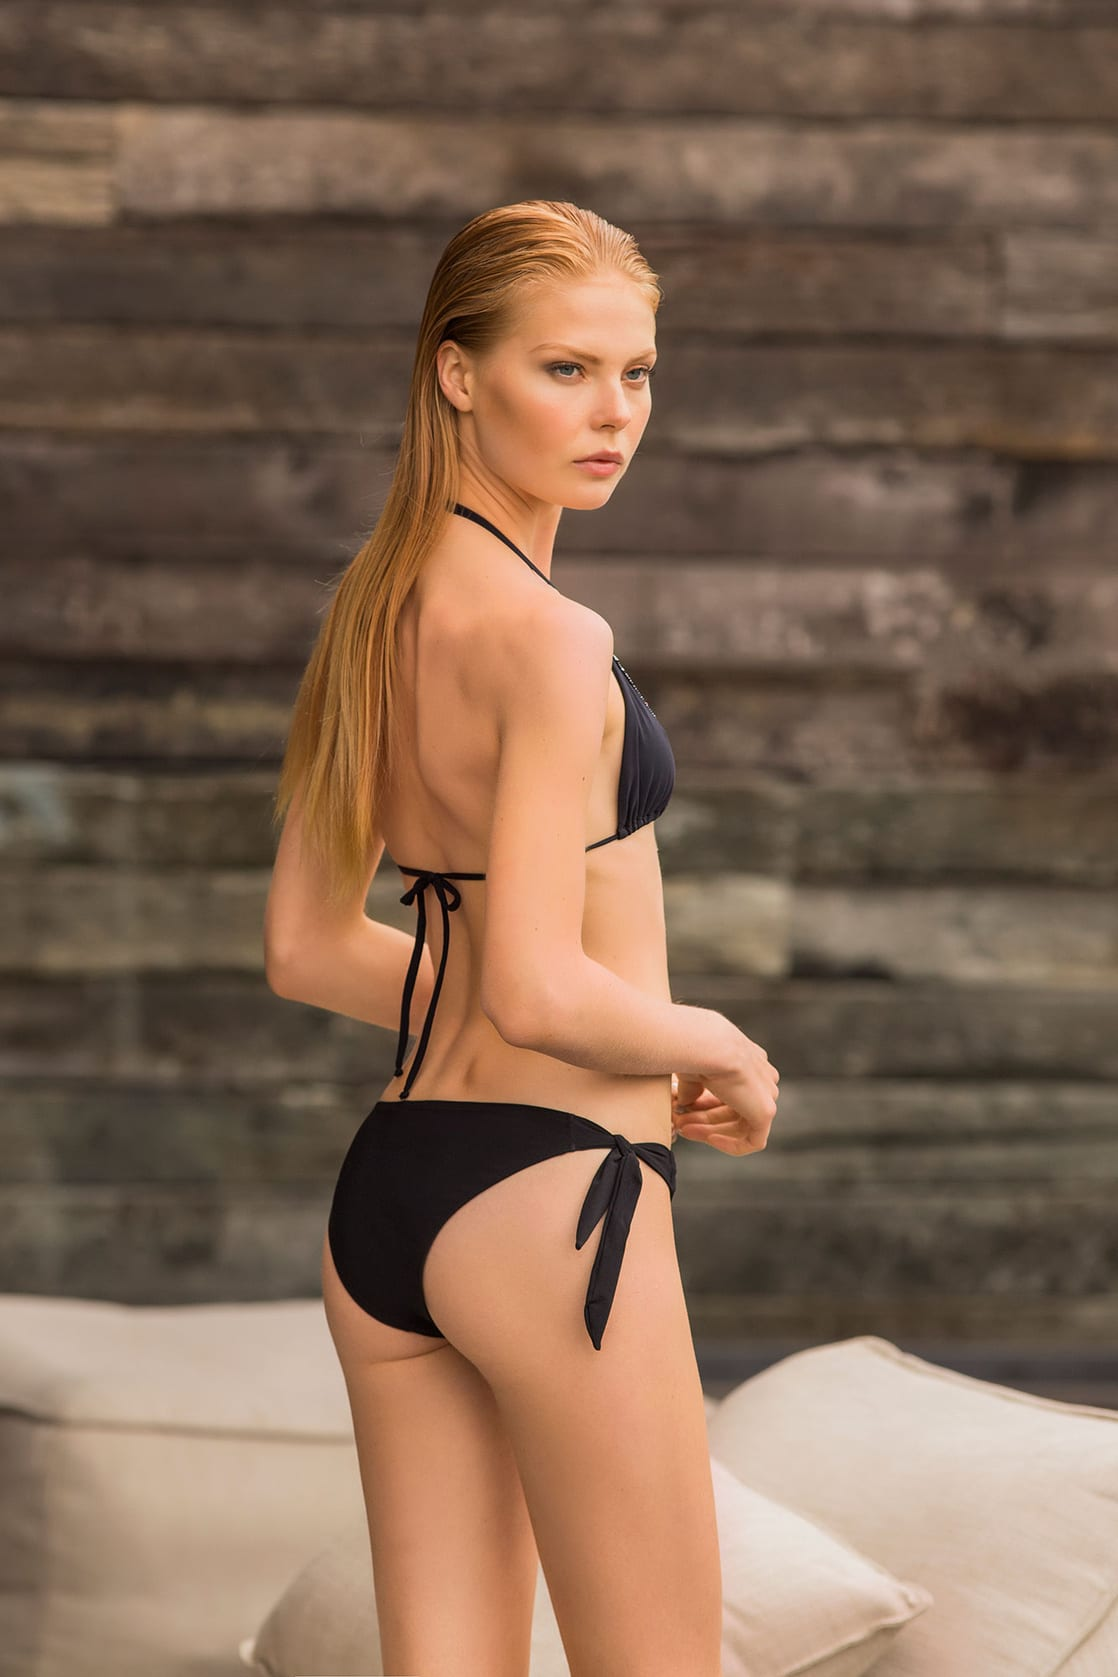 Bikini Sofie Theobald nude photos 2019